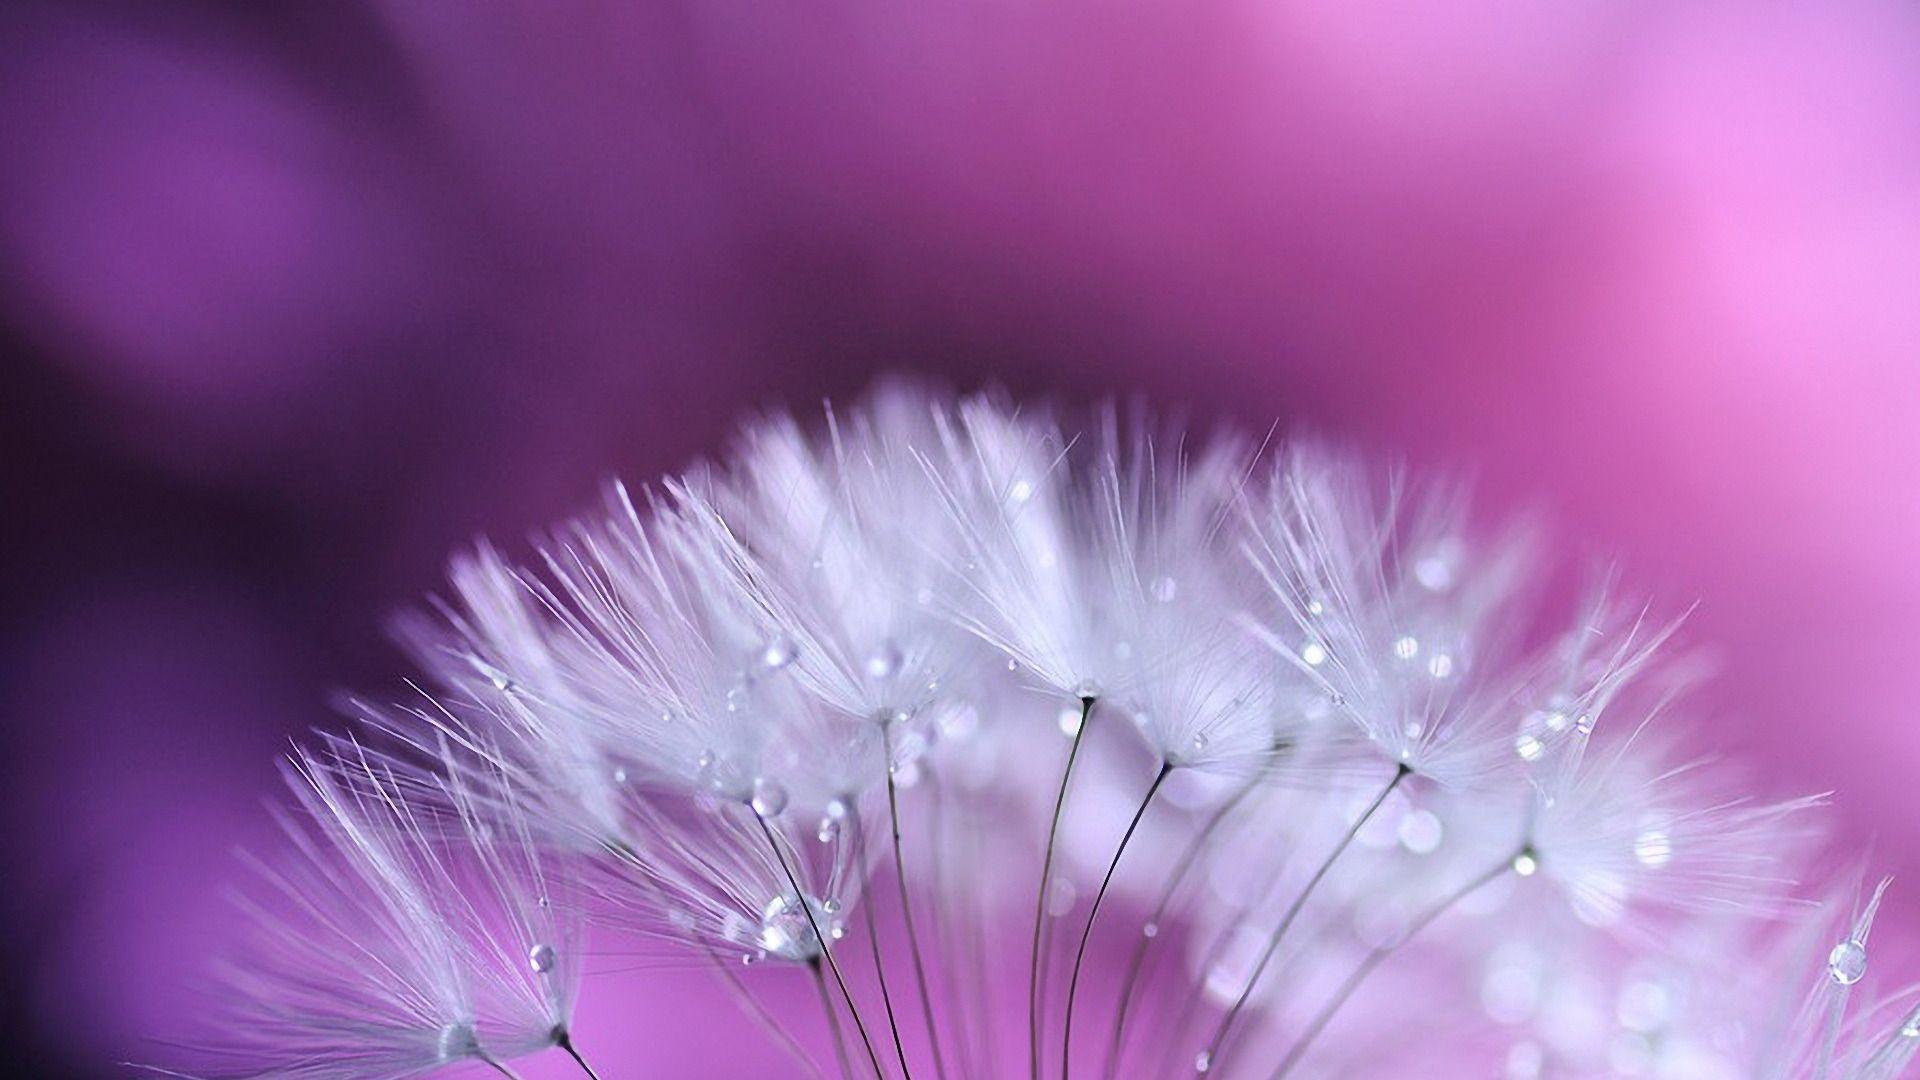 Dandelion beautiful wallpaper